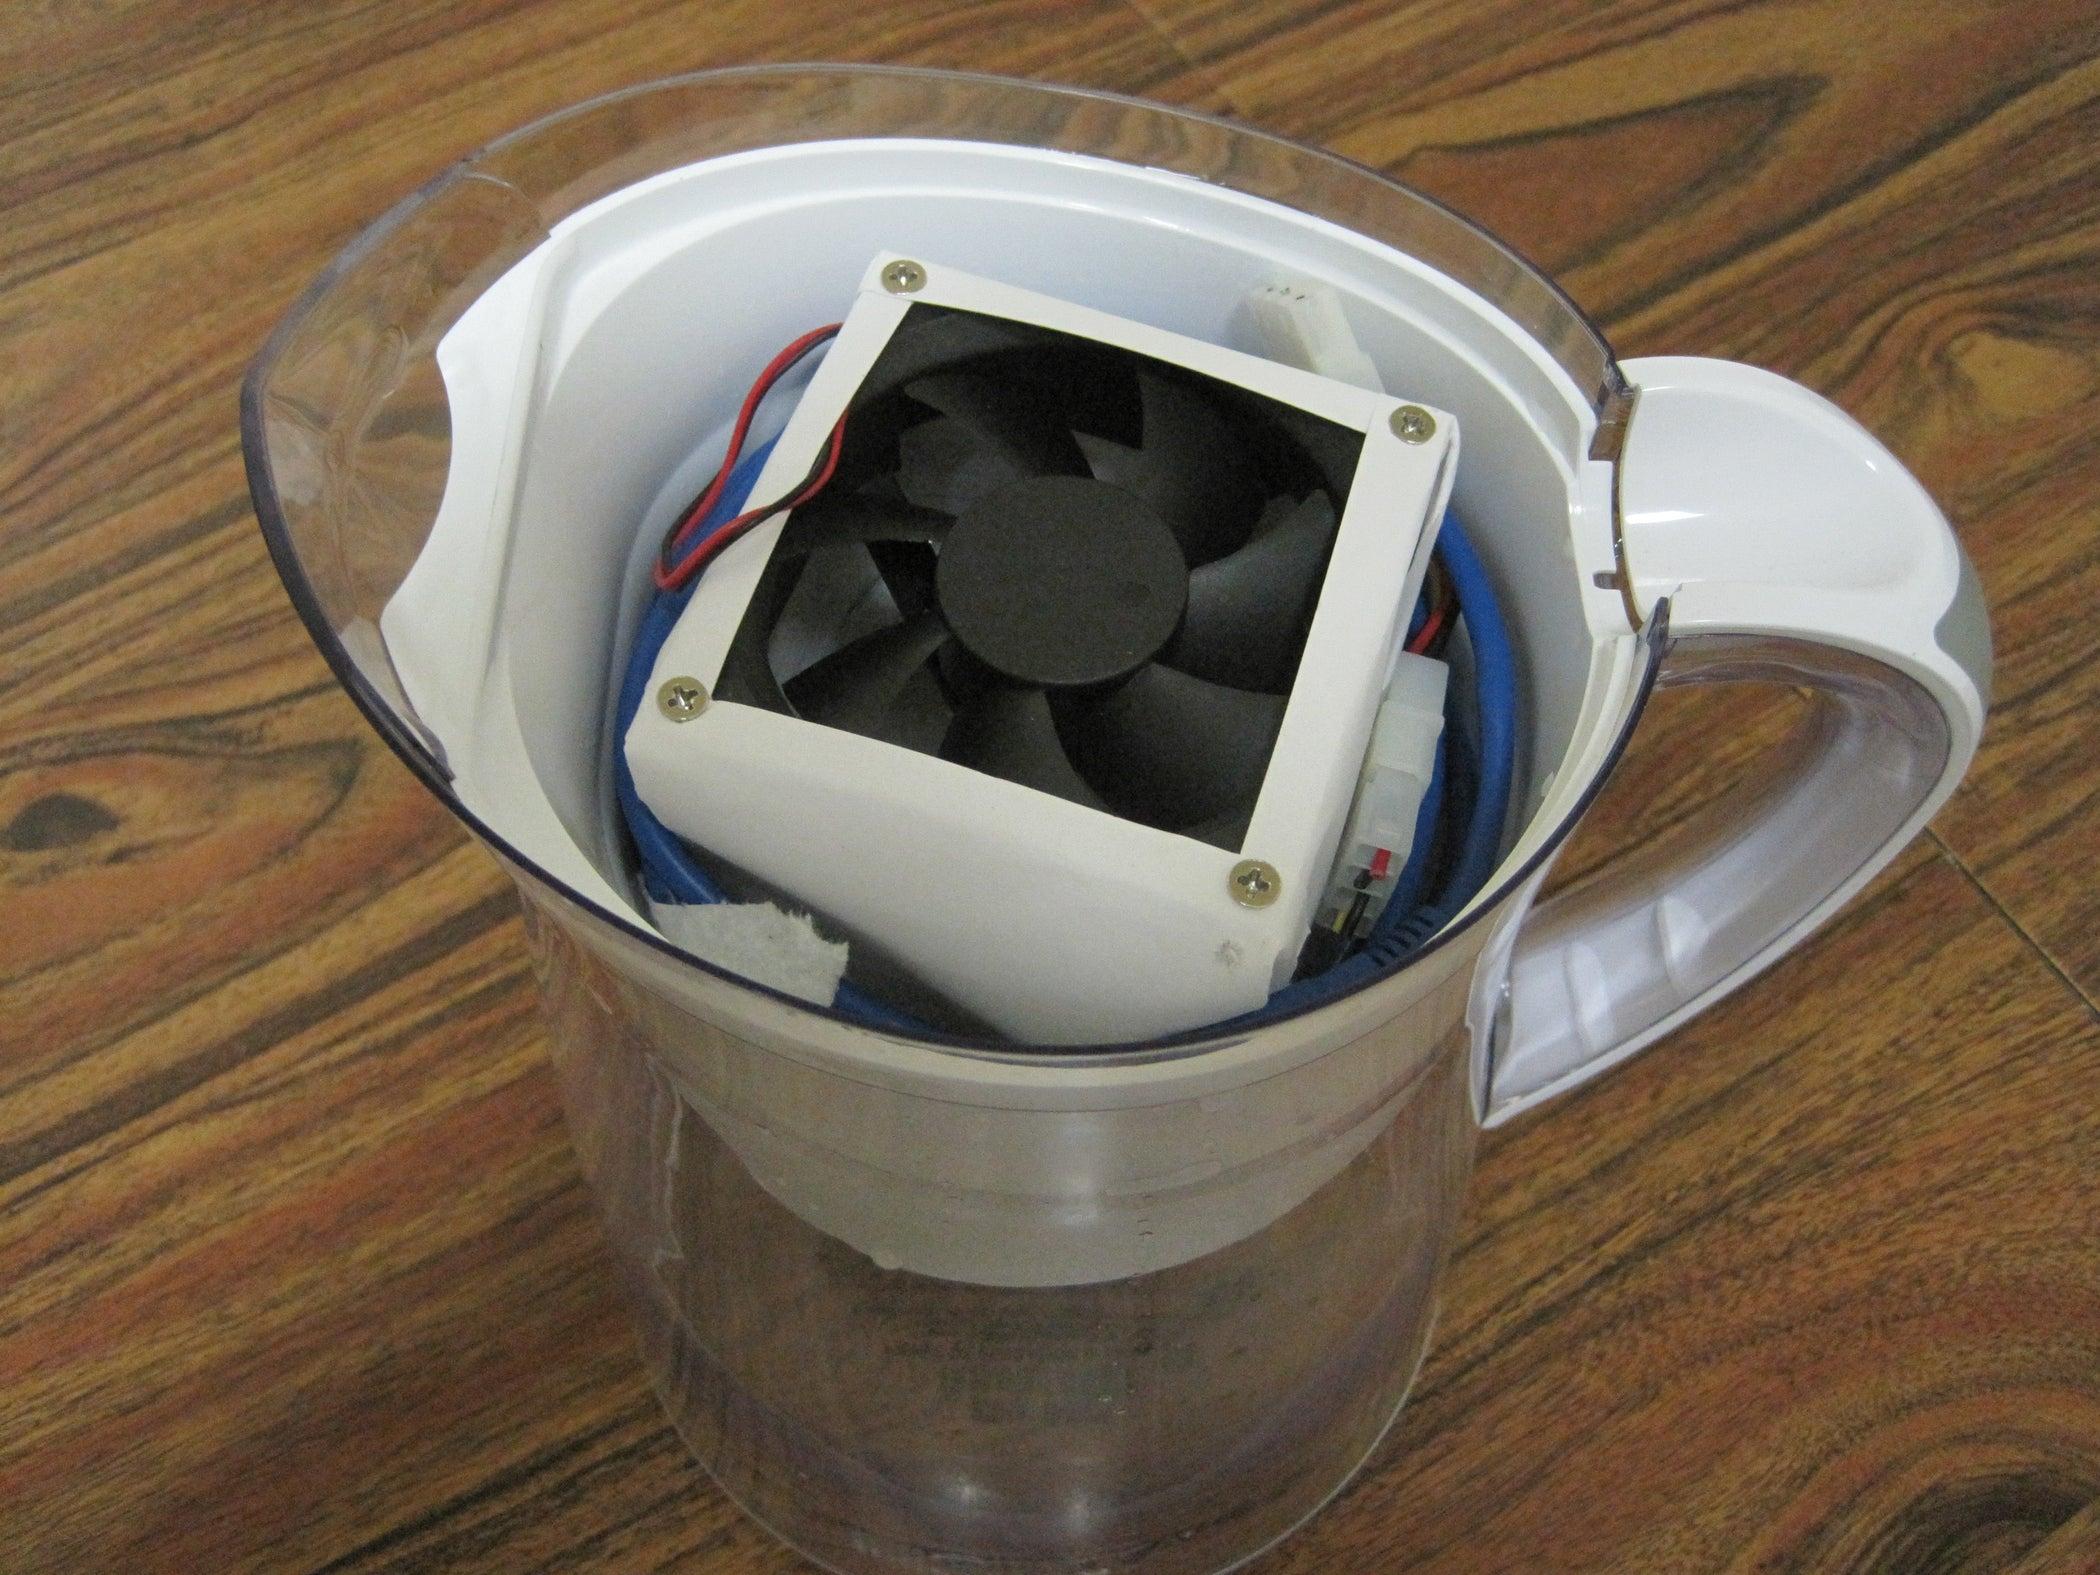 Build a Discreet USB Air Conditioner With a Brita Pitcher: 7 Steps